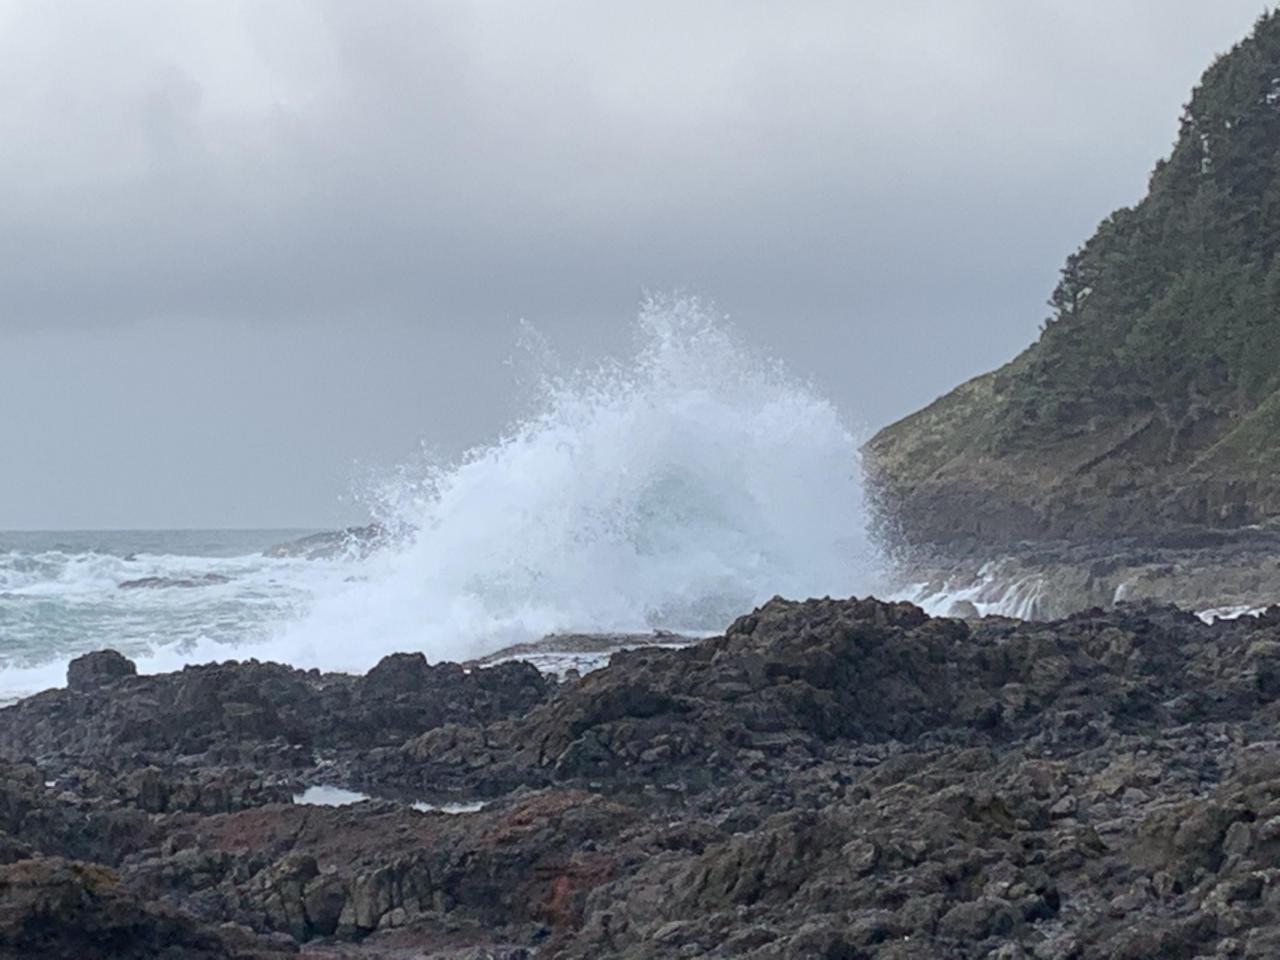 Entrance to Devil's Churn Cape Perpetua